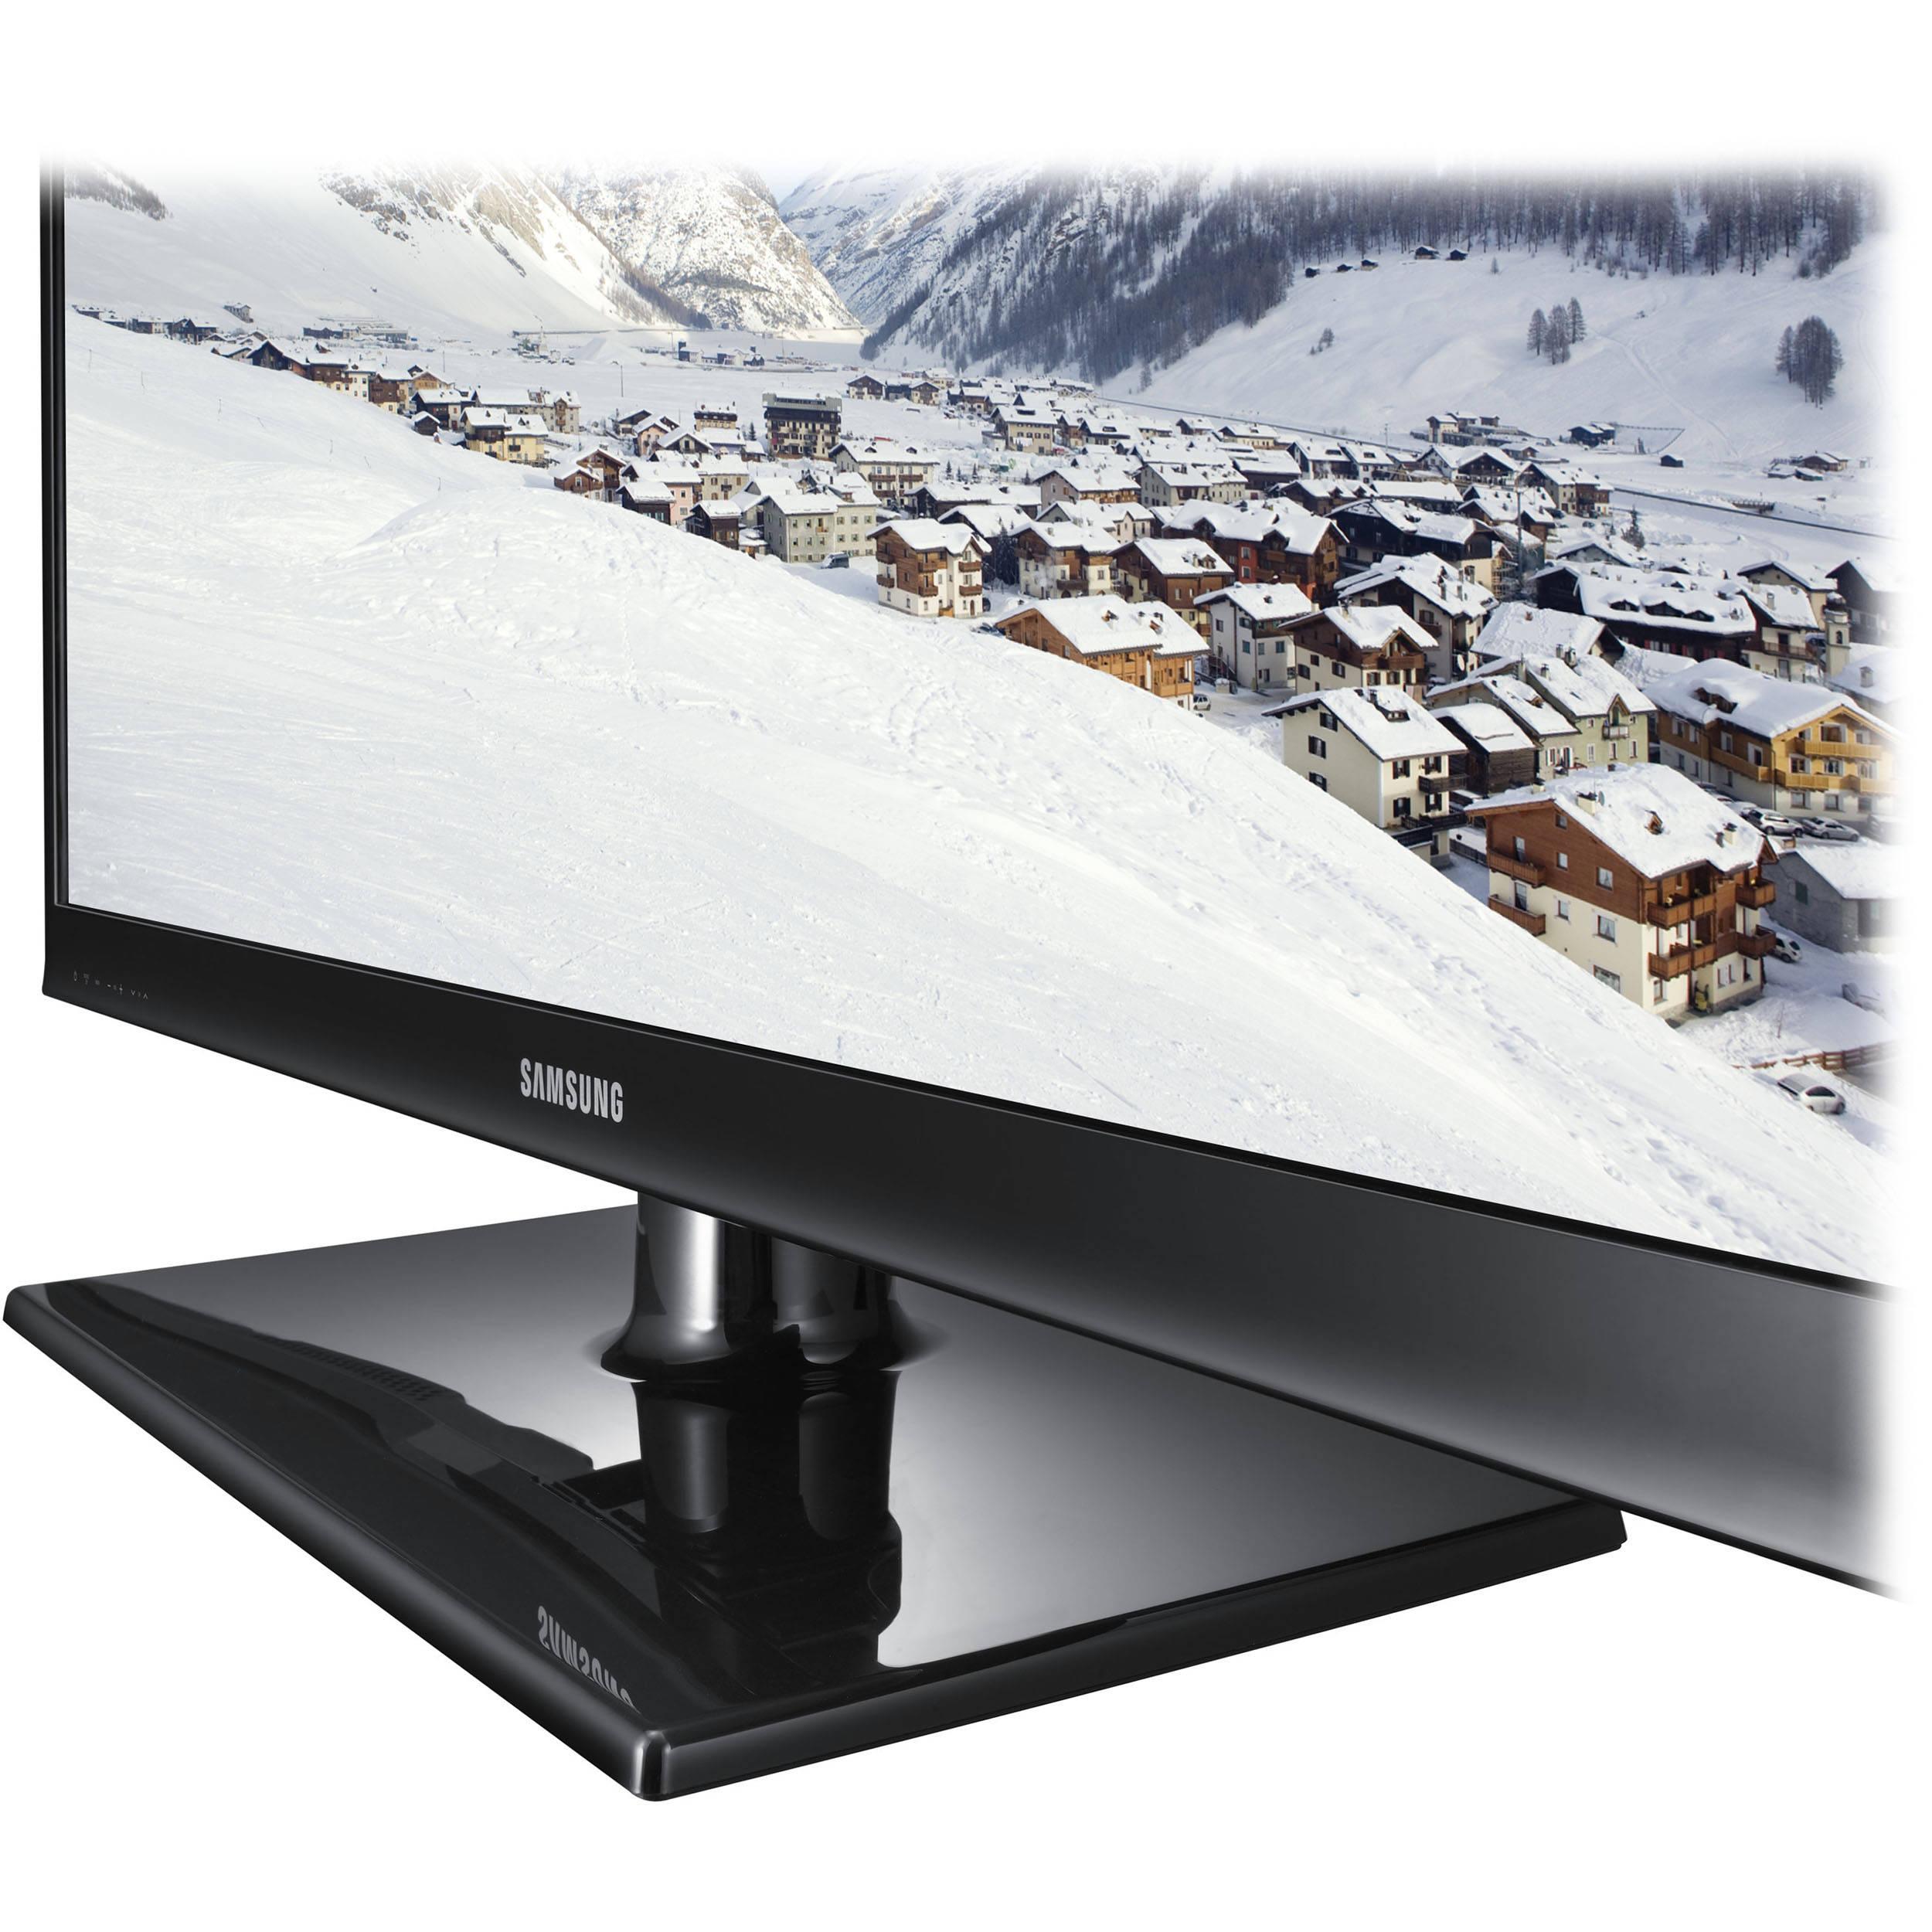 Samsung PN43D450 43